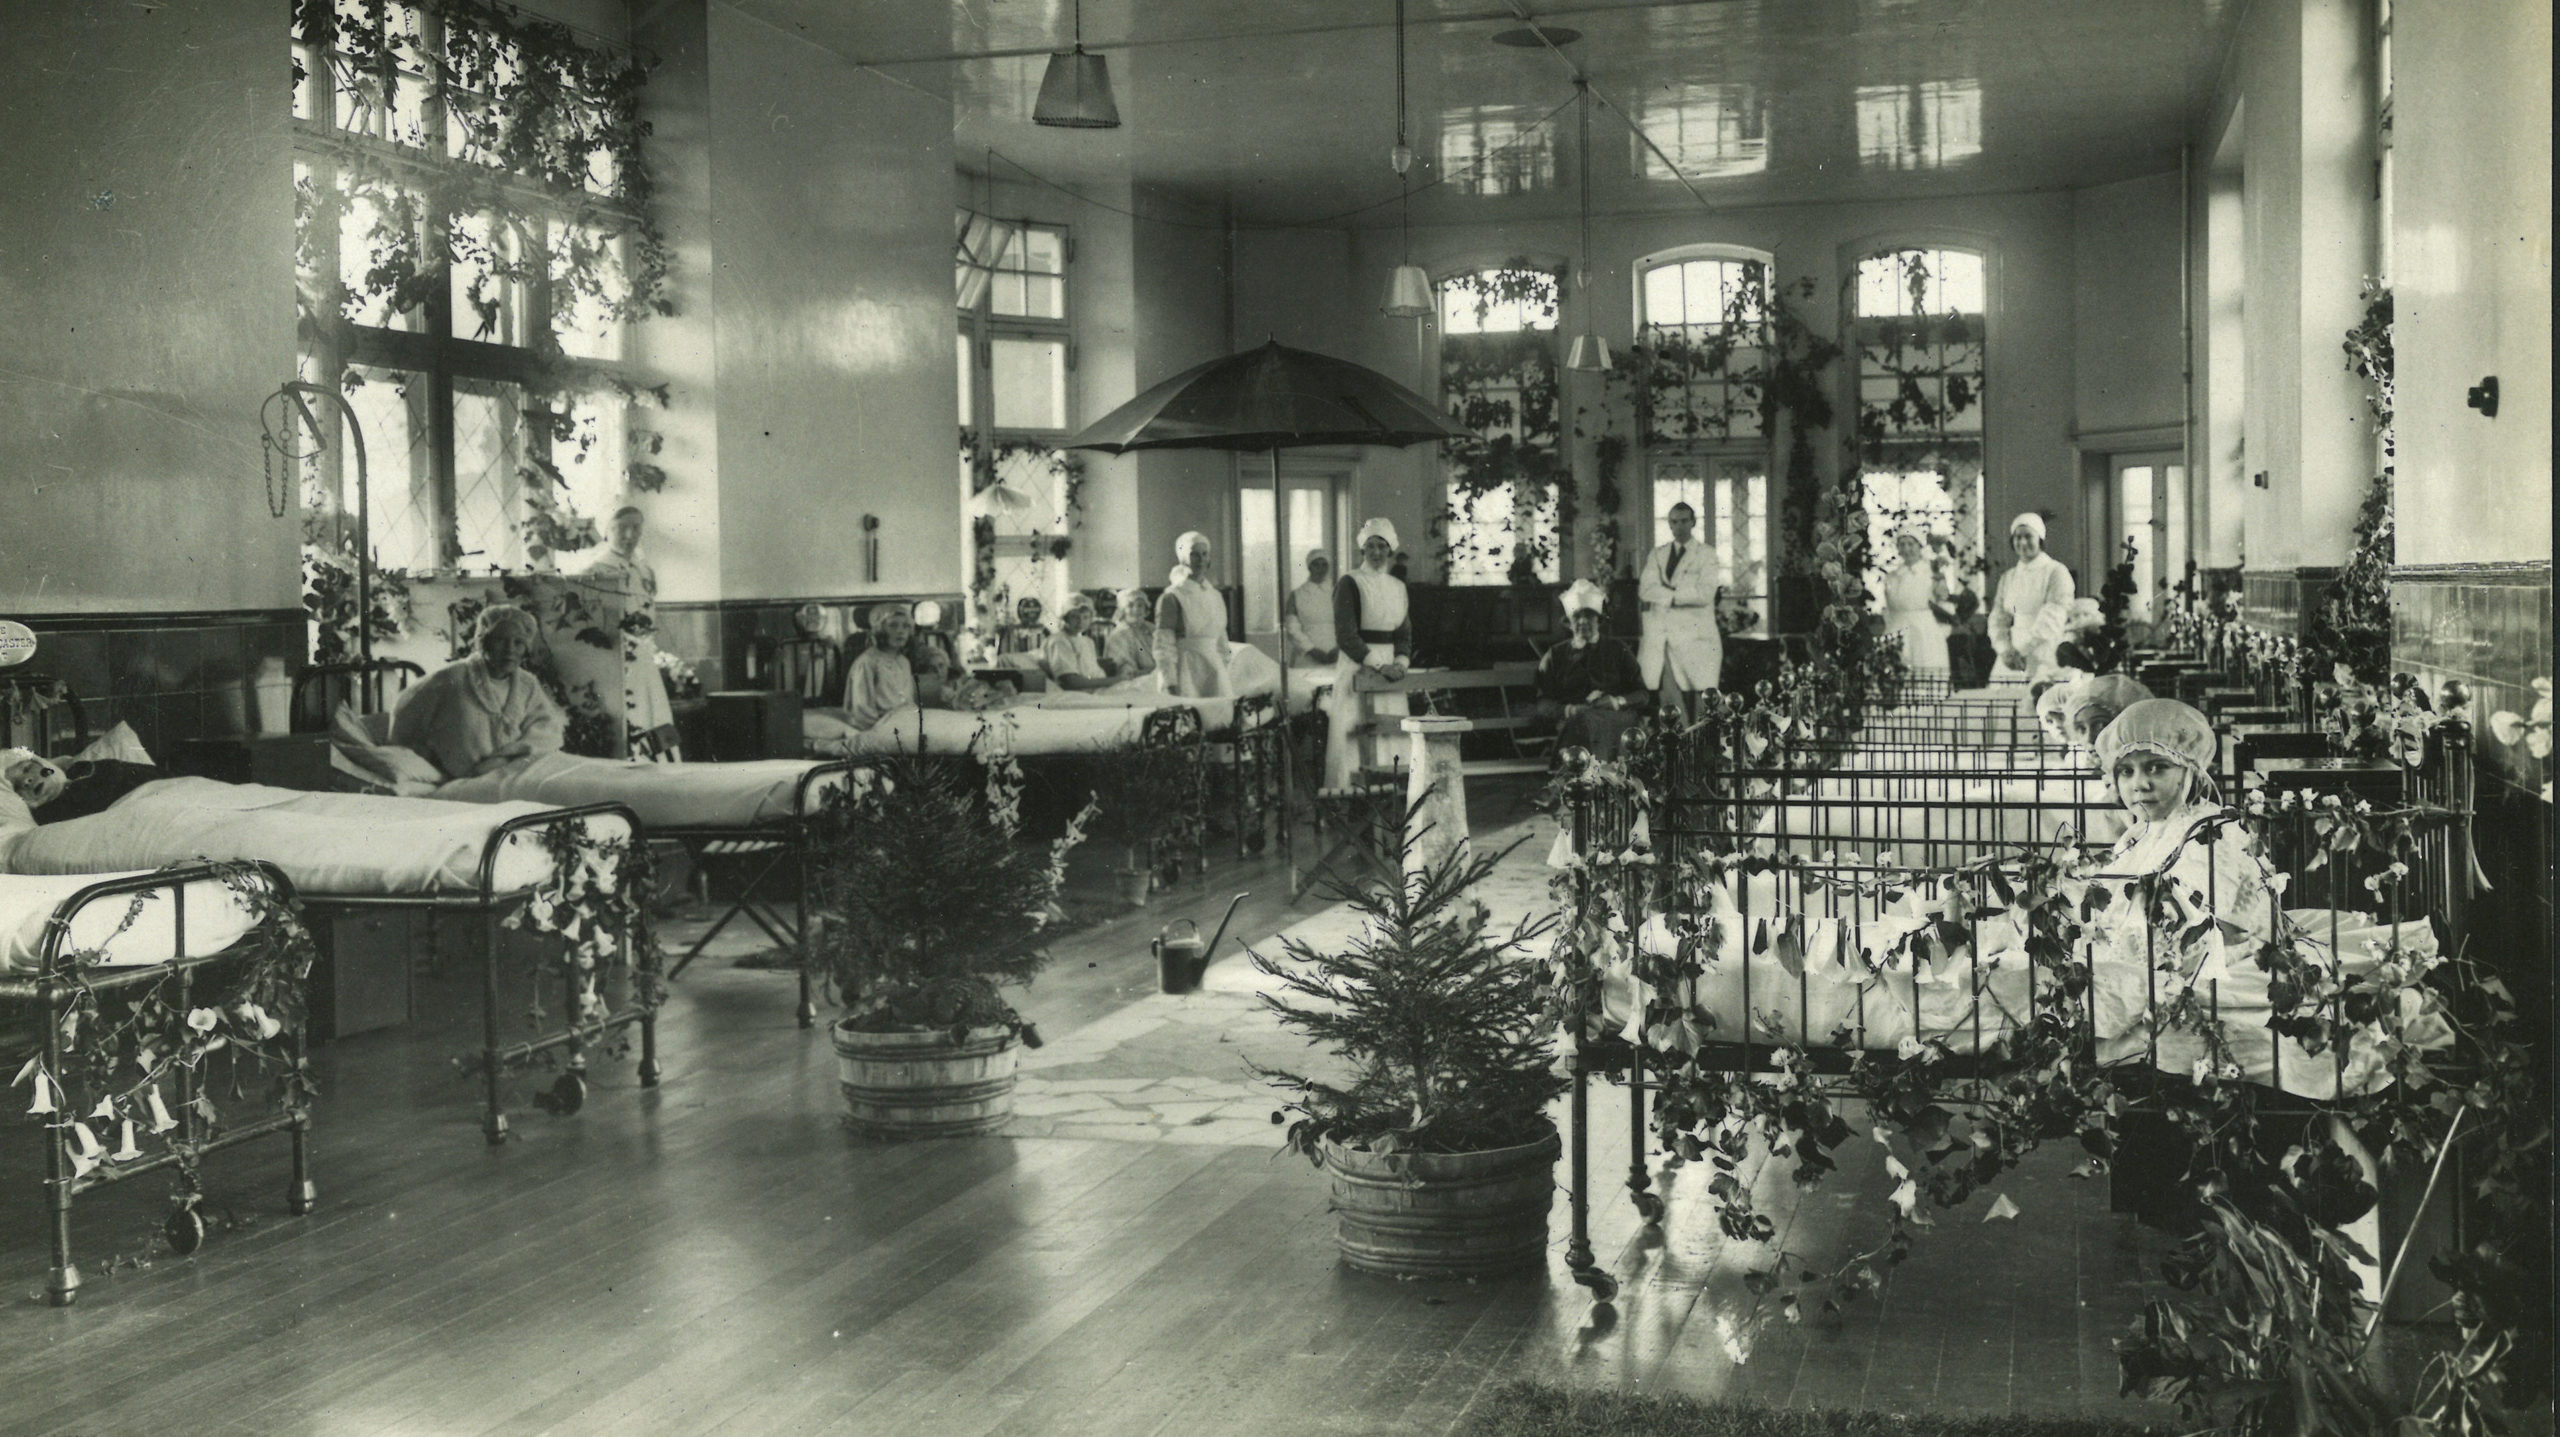 Decorated hospital ward, c. 1900